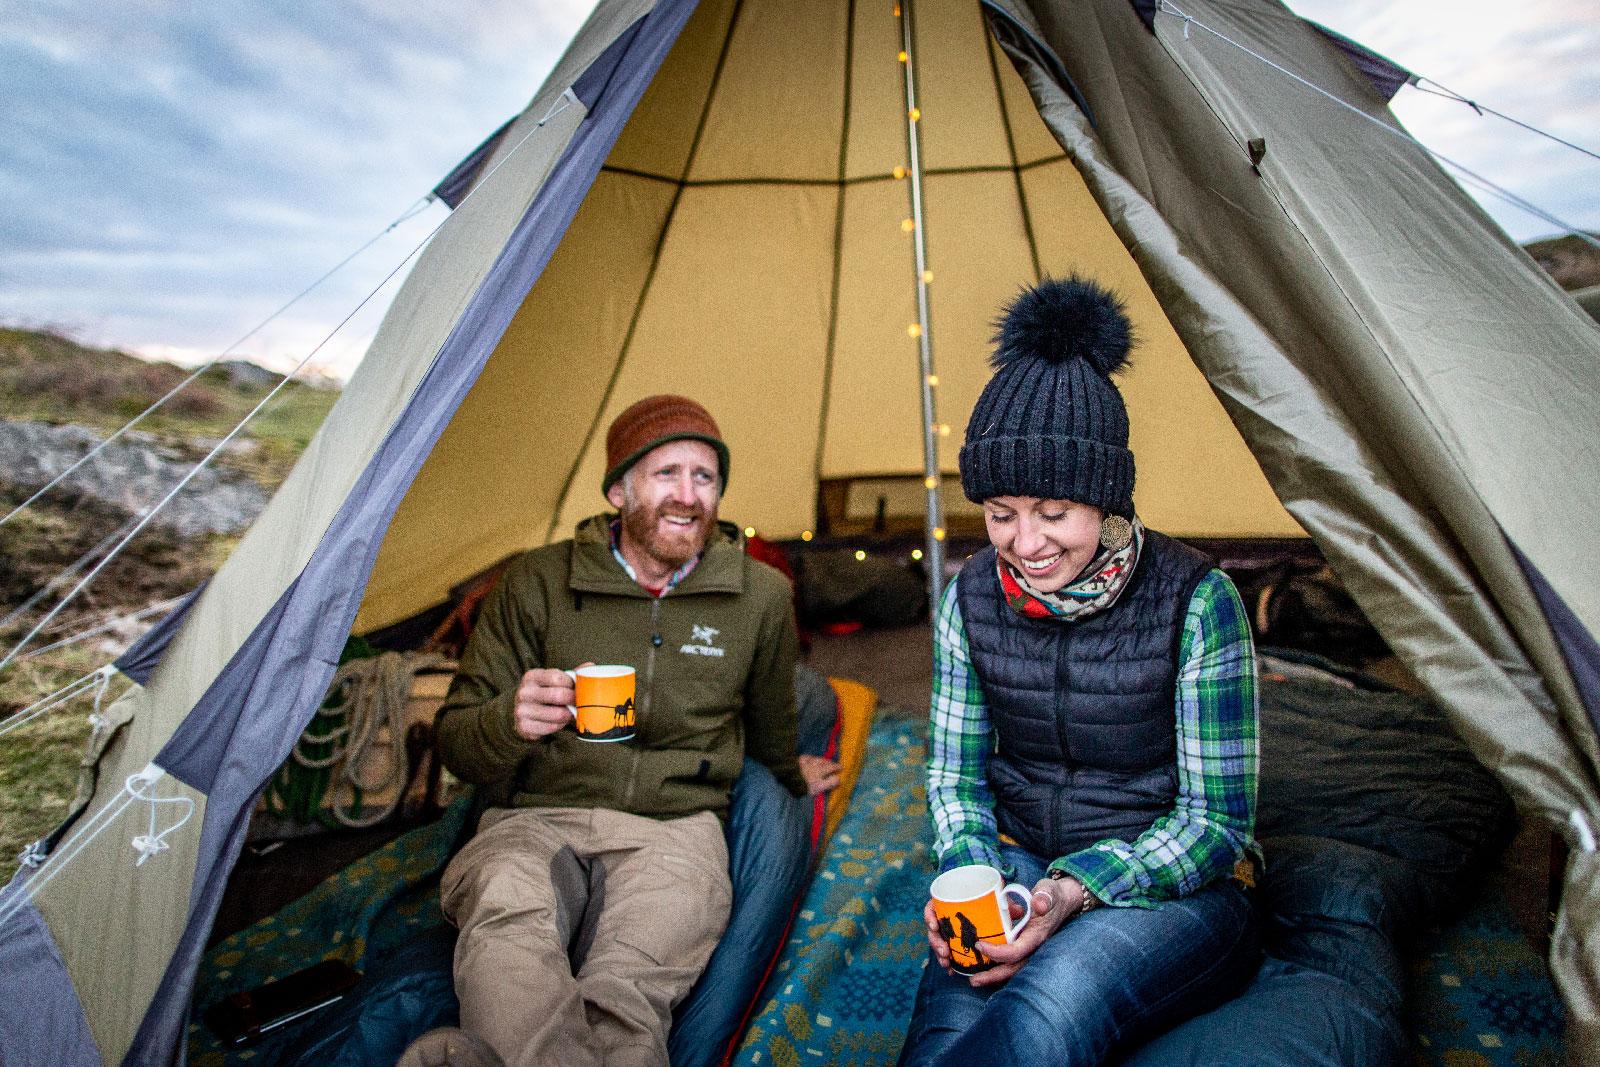 Award-winning    Robens    technical tents, mattresses and sleeping bags